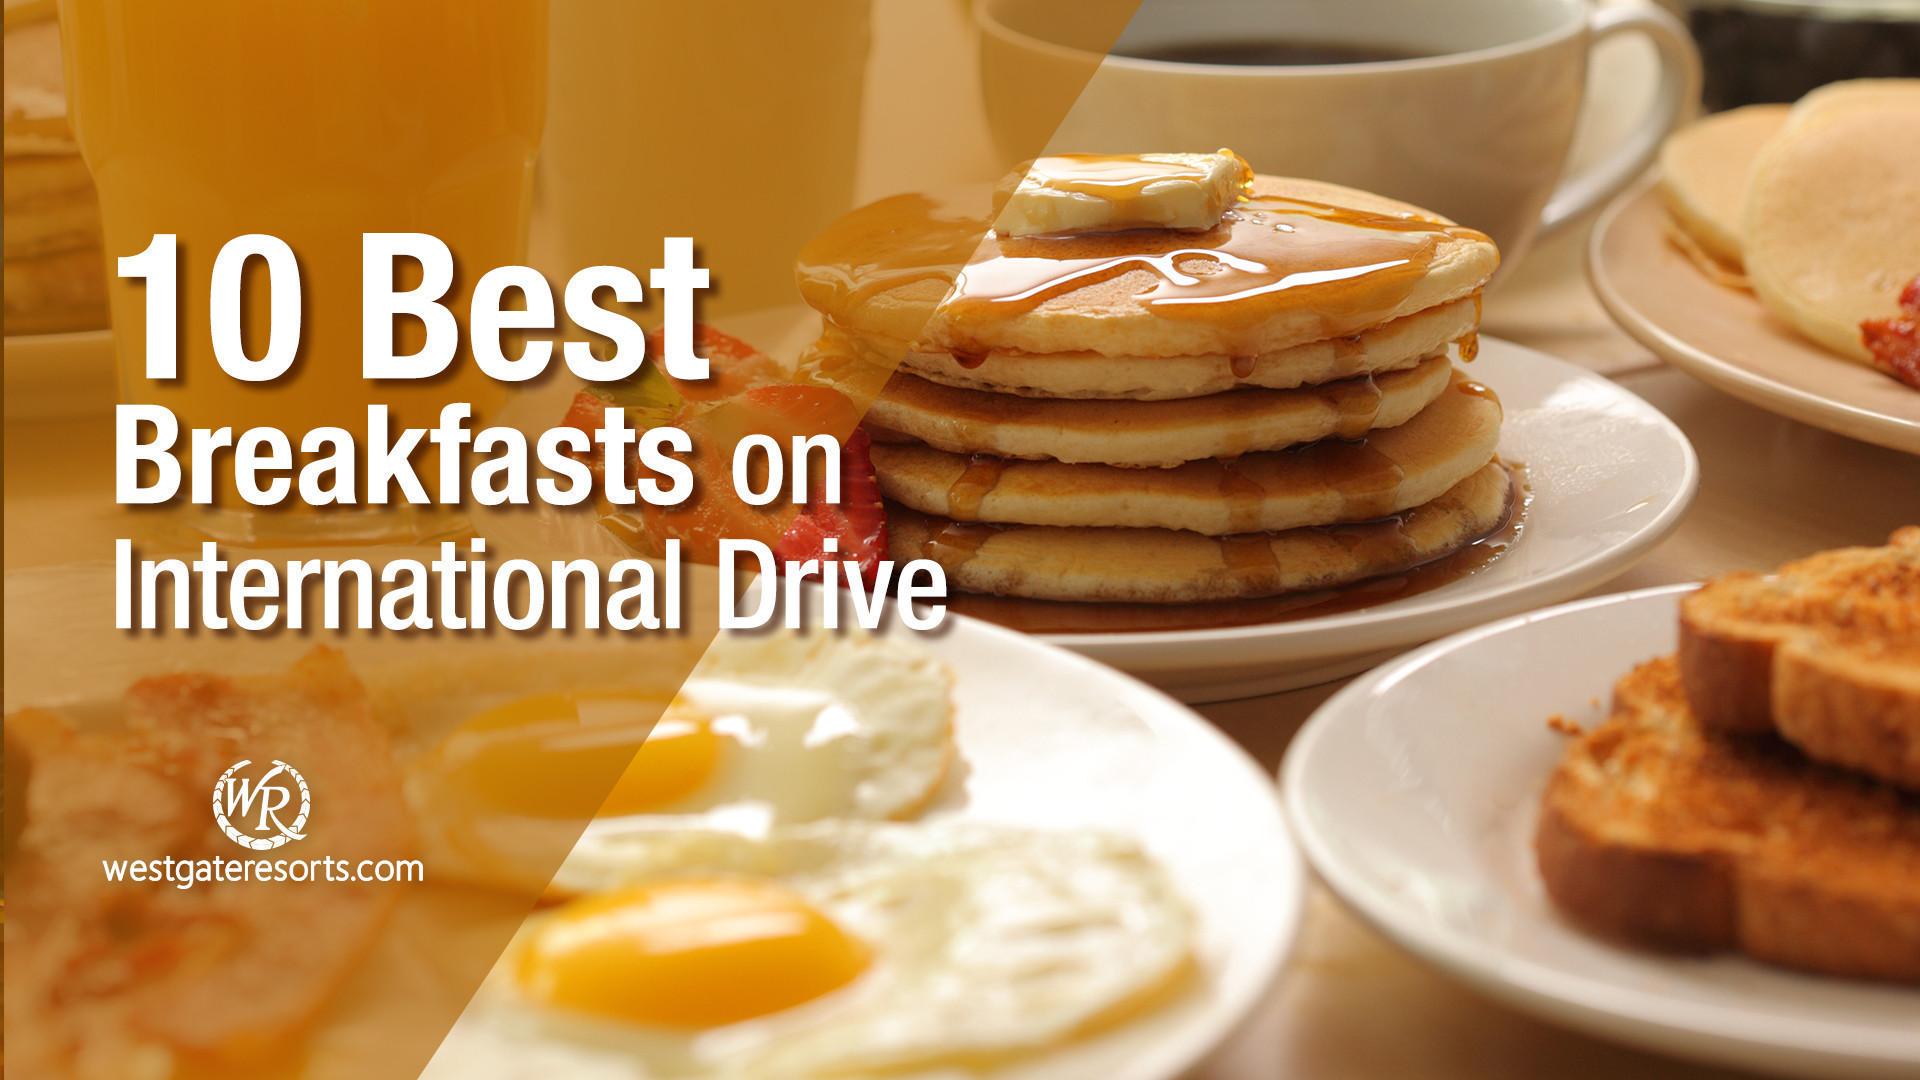 10 Best Breakfasts In Orlando On International Drive I